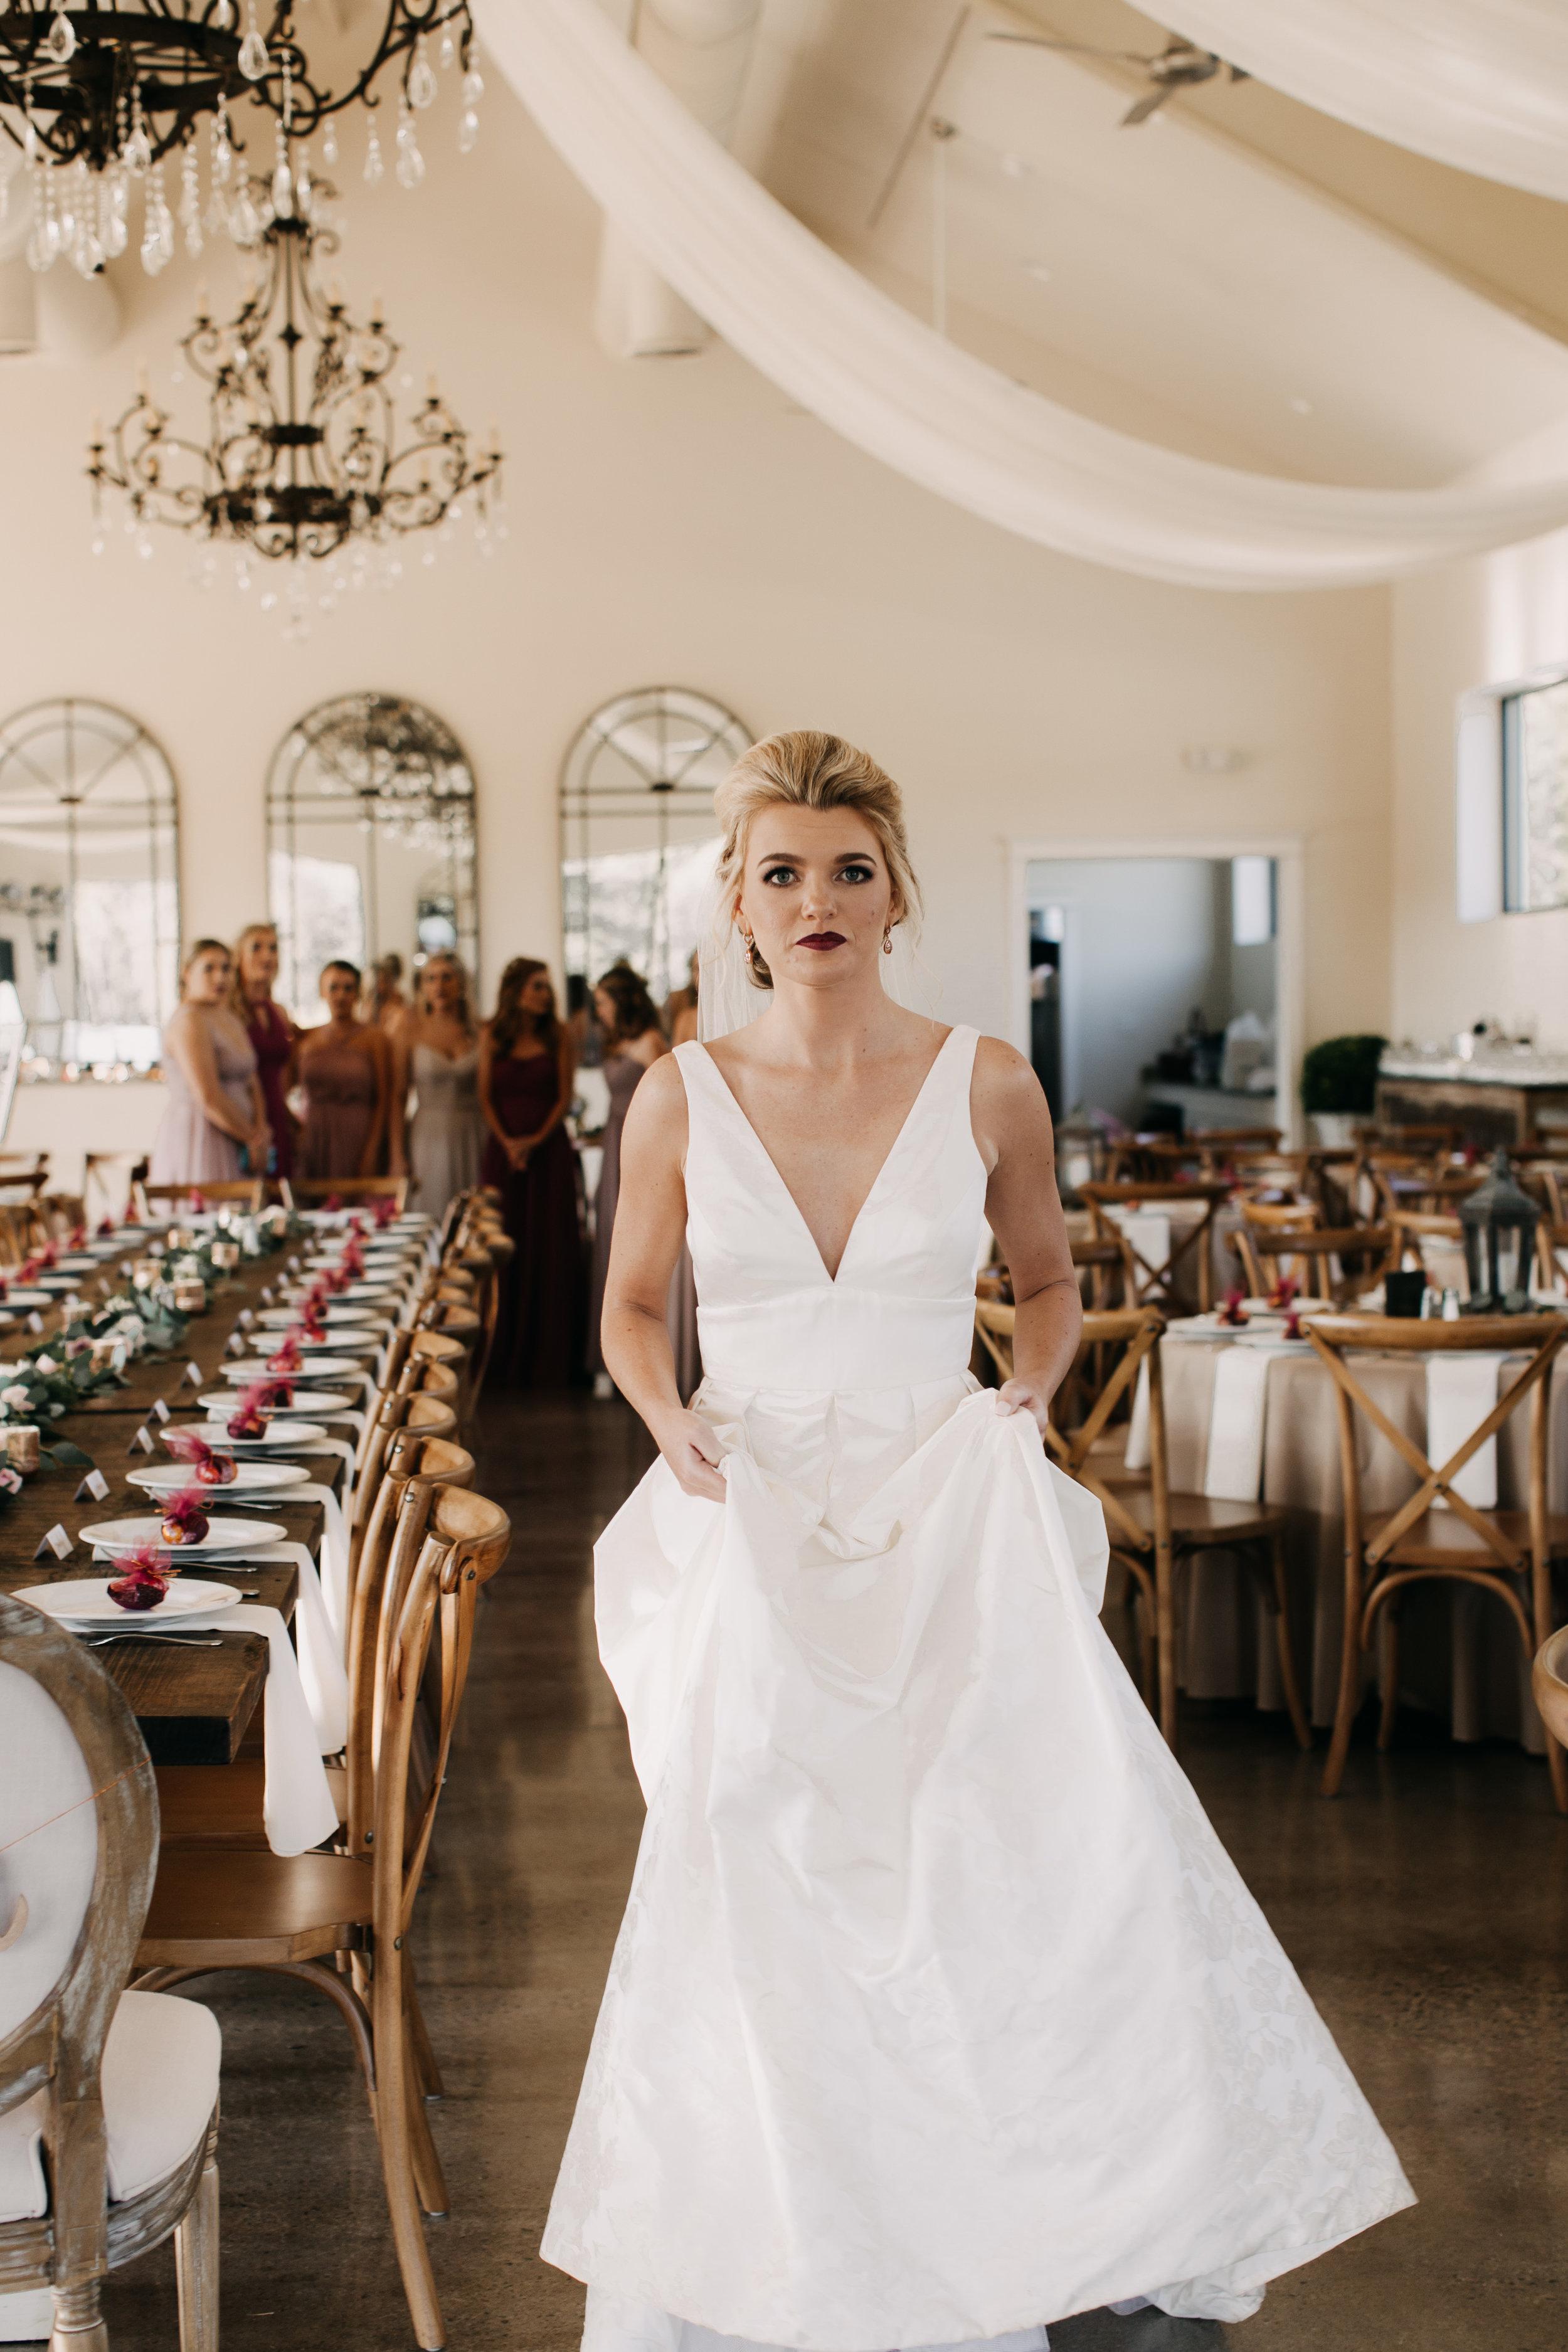 Kaylyn & Ryan Final Wedding Photos177.jpg